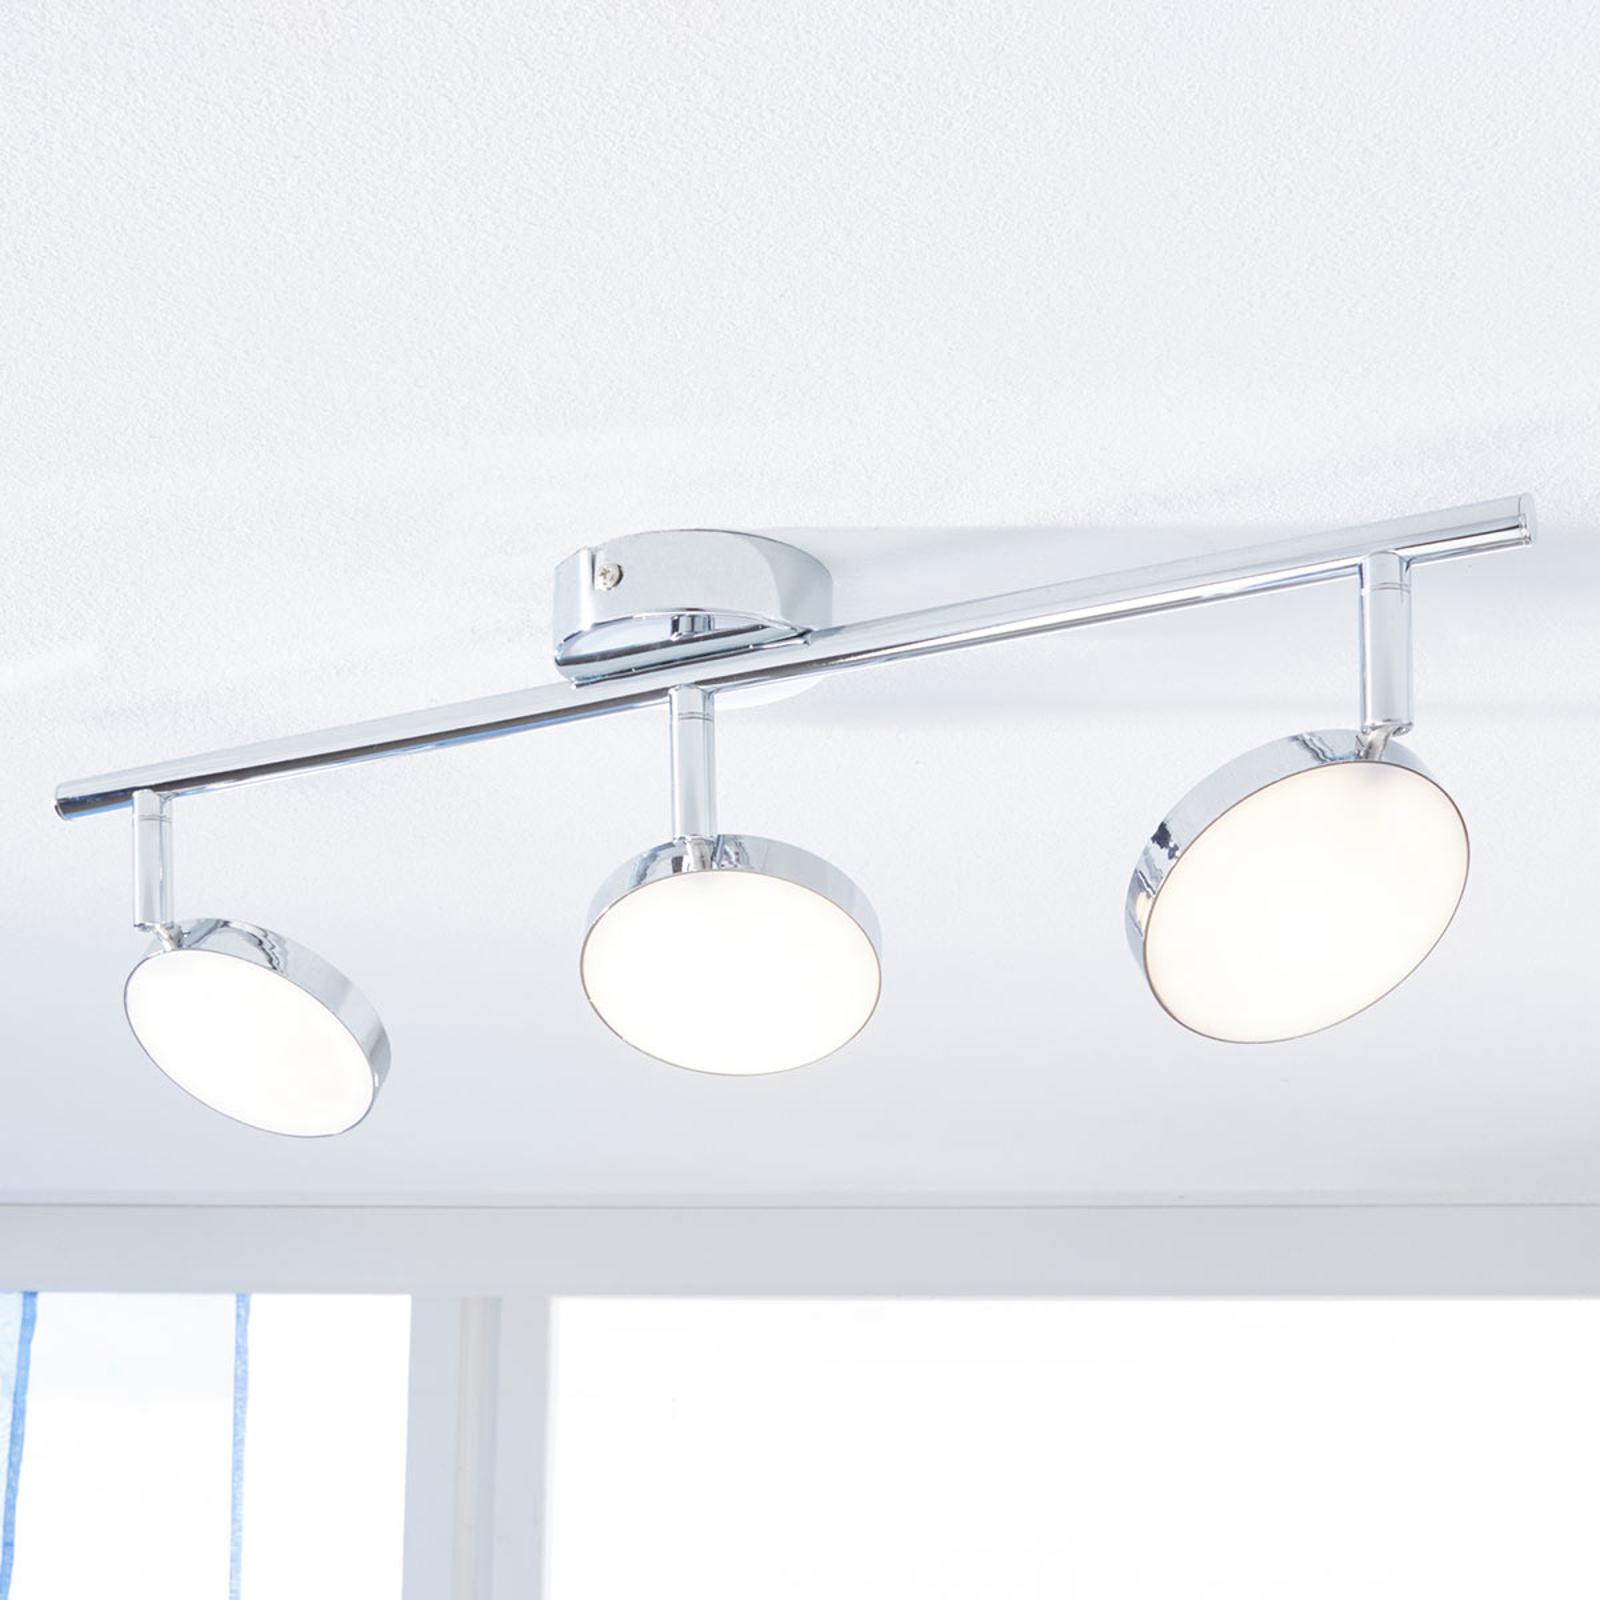 LED-Deckenstrahler Keylan, 3-flammig, länglich